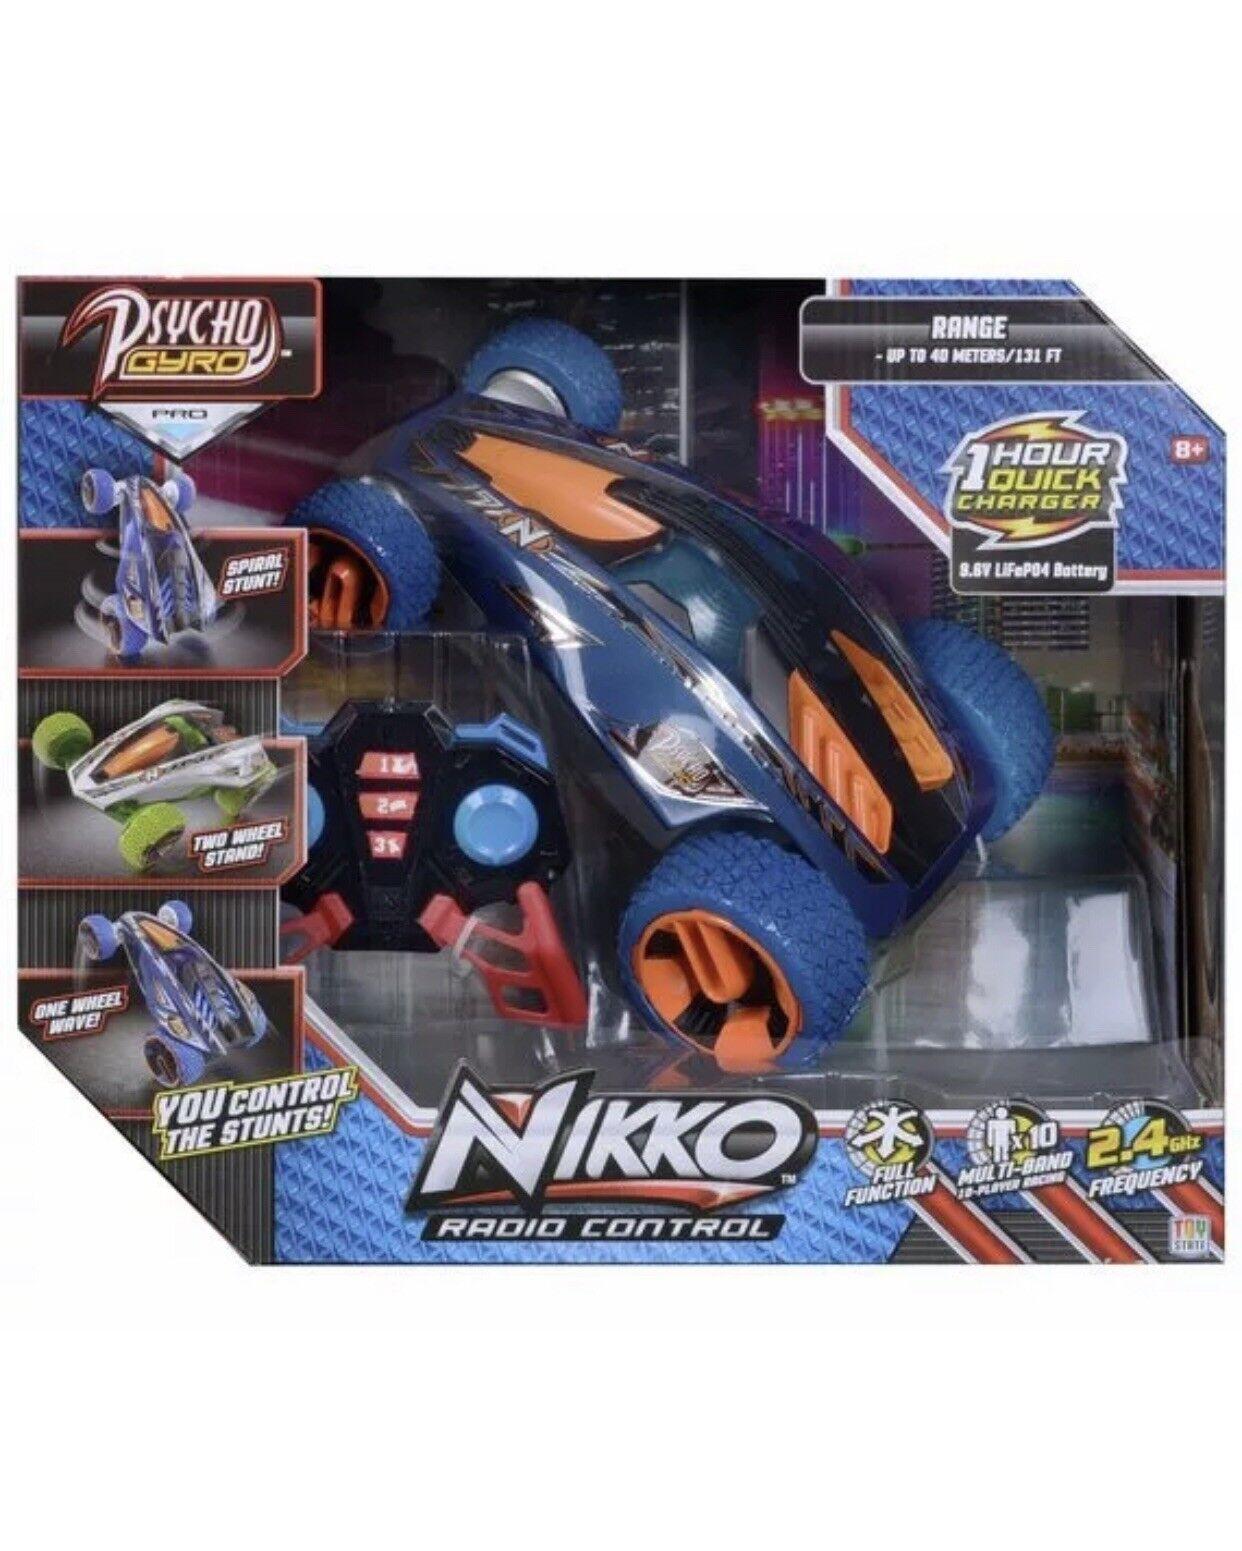 Nikko R C Psycho Gyro Toy bluee kids car radio control